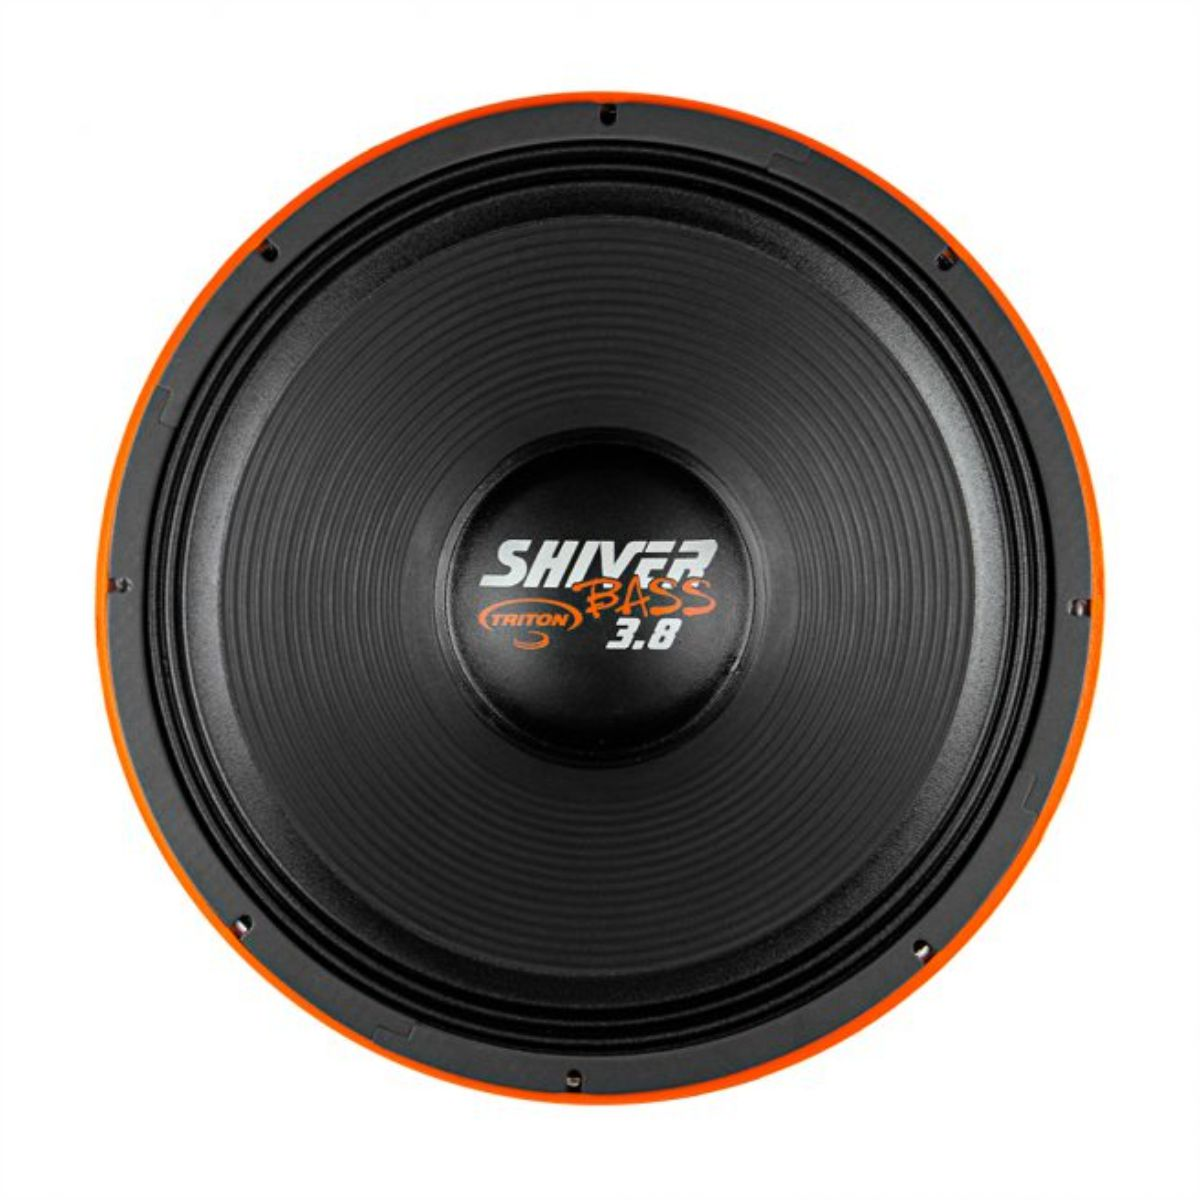 "Alto Falante Woofer Triton 18"" Shiver Bass 3.8 1900W Rms 3800W Pmpo 4 Ohms"